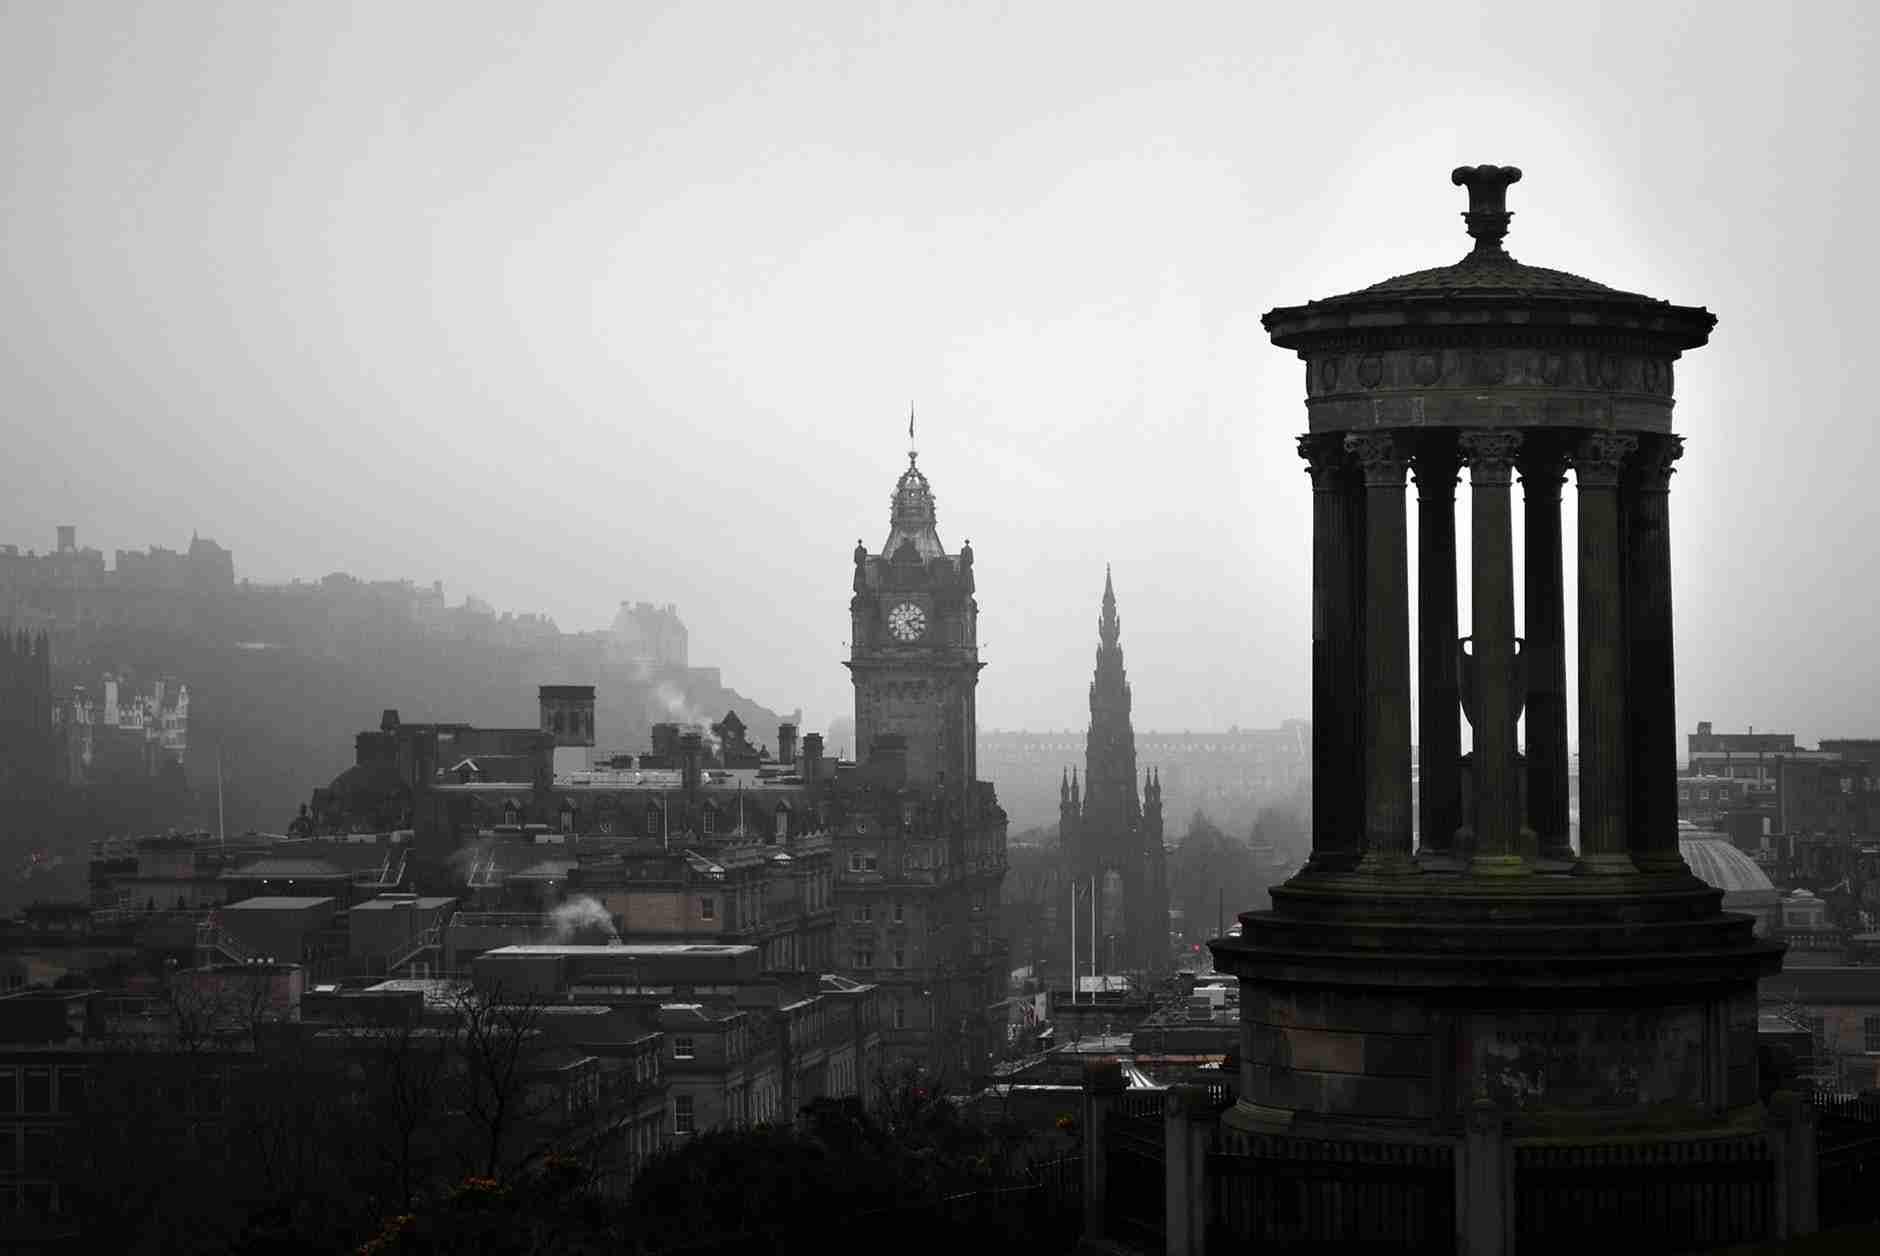 most iconic buildings in Scotland: skyline of Edinburgh